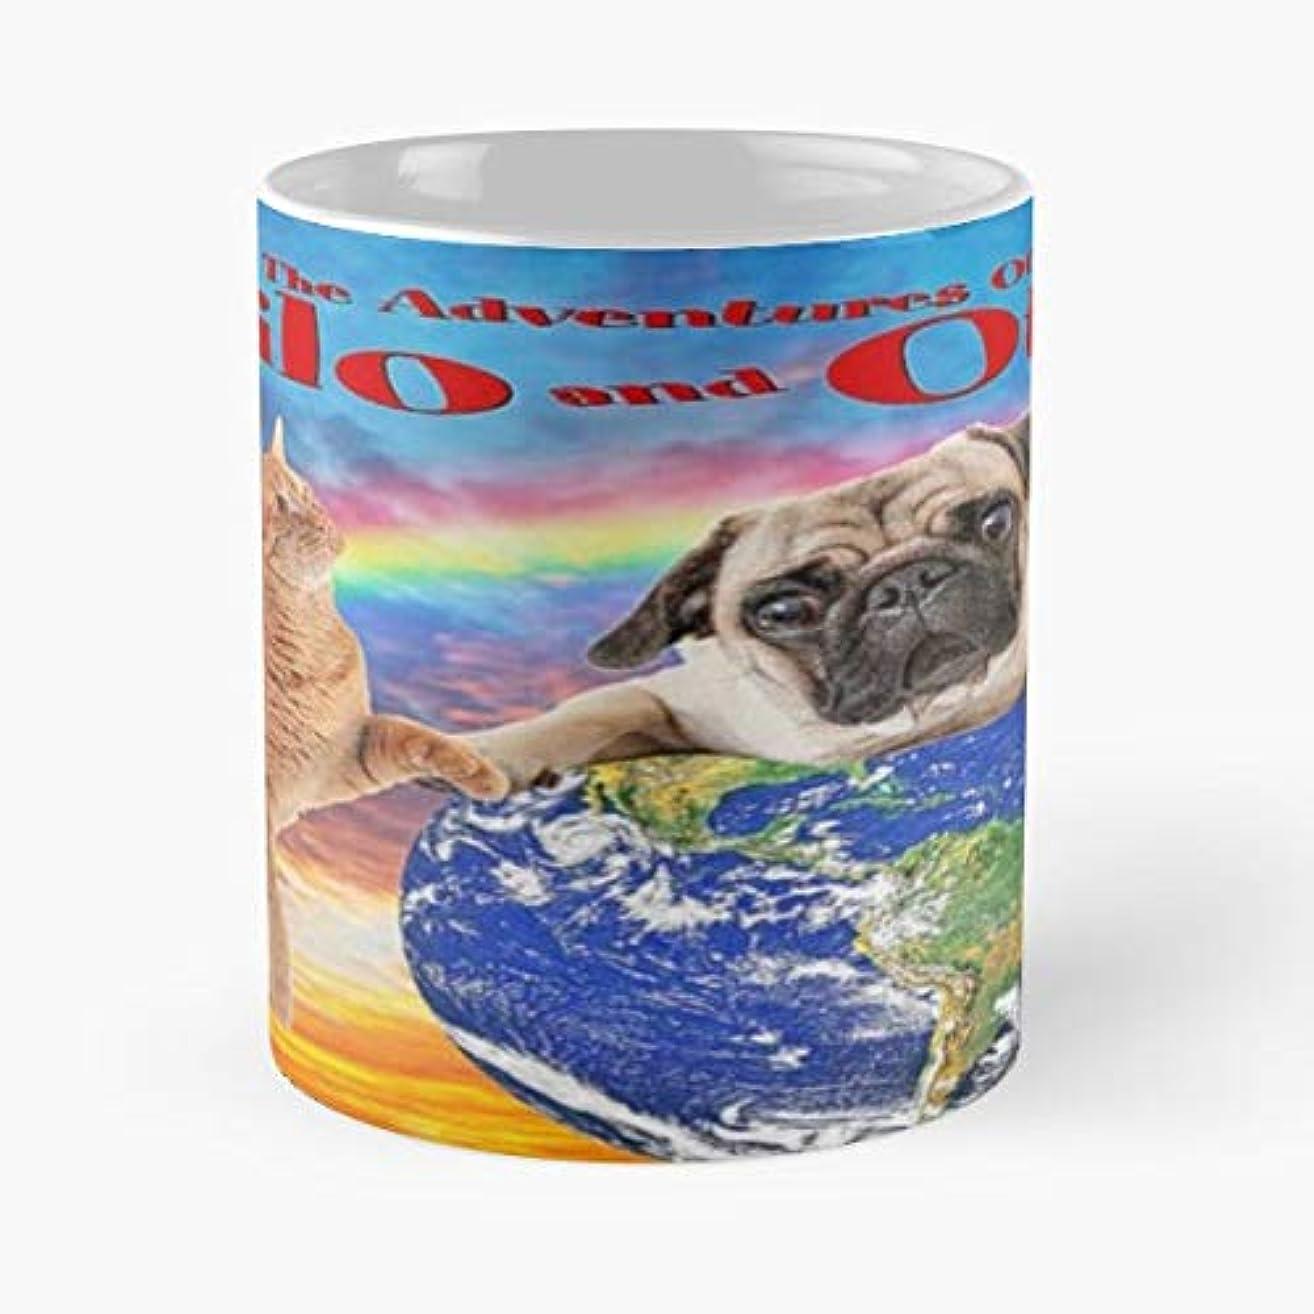 Milo And Otis Pug Dog Cat Coffee Mugs Unique Ceramic Novelty Cup